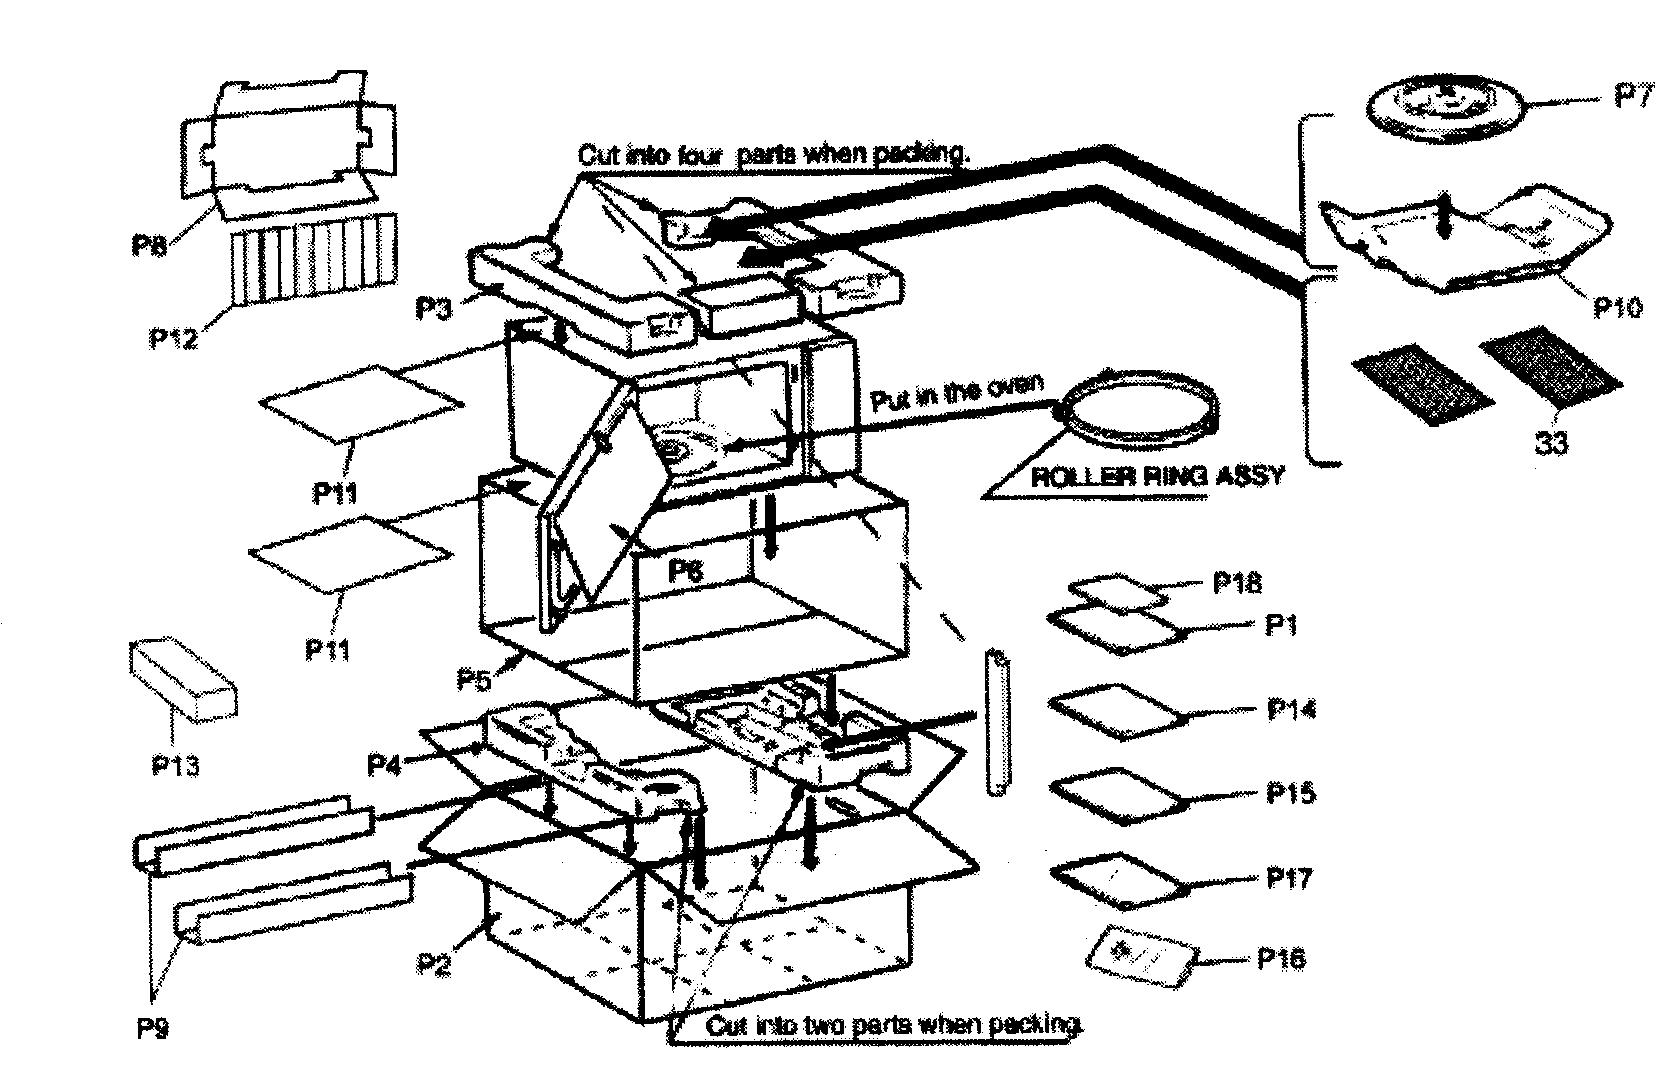 Panasonic model NN-P295SF microwave/hood combo genuine parts